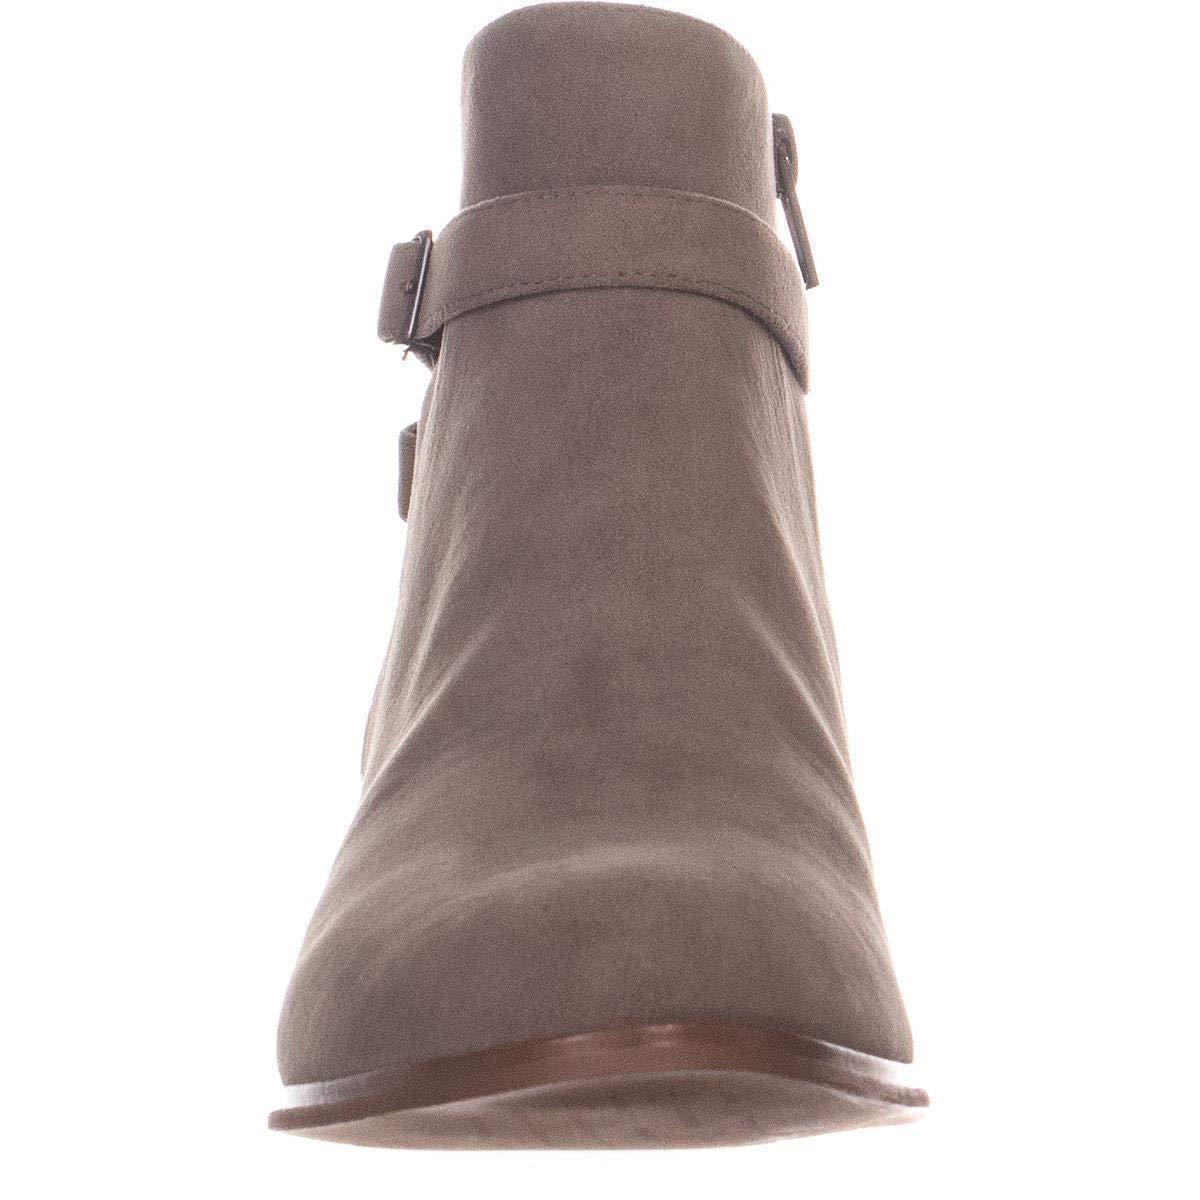 thumbnail 17 - Giani-Bernini-Womens-Dorii-Leather-Almond-Toe-Ankle-Fashion-Boots